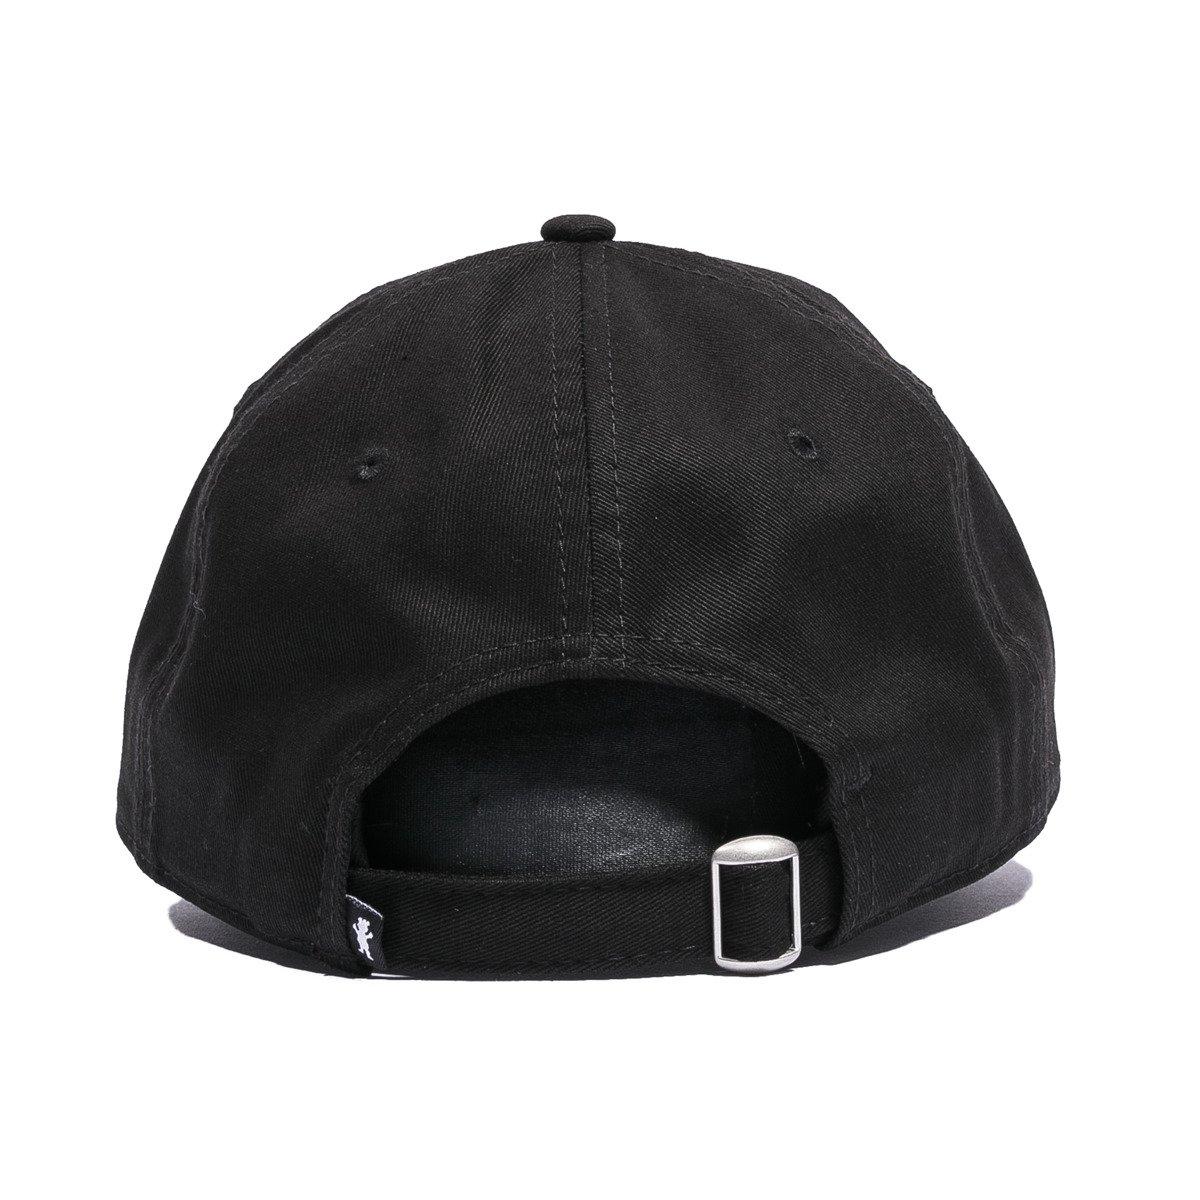 Miniramp Skateshop czapka grizzly x venom dad hat black 7fac65276cf